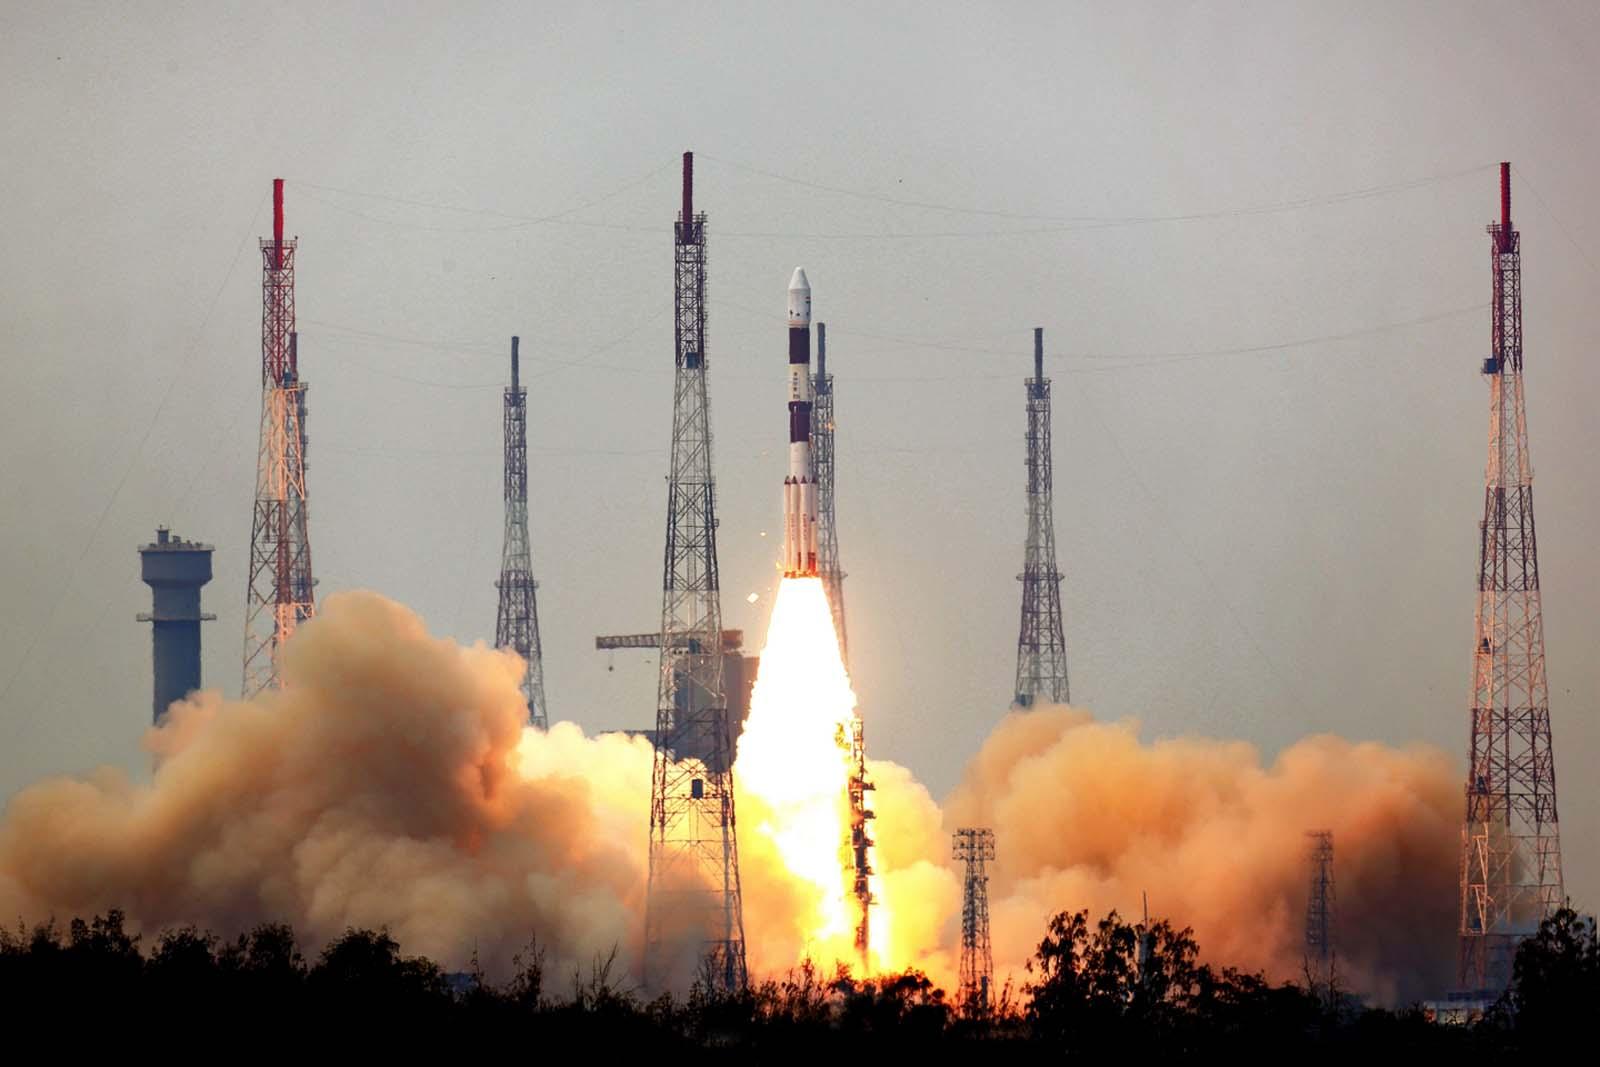 U S  launch companies lobby to maintain ban on use of Indian rockets   SpaceNews com SpaceNews